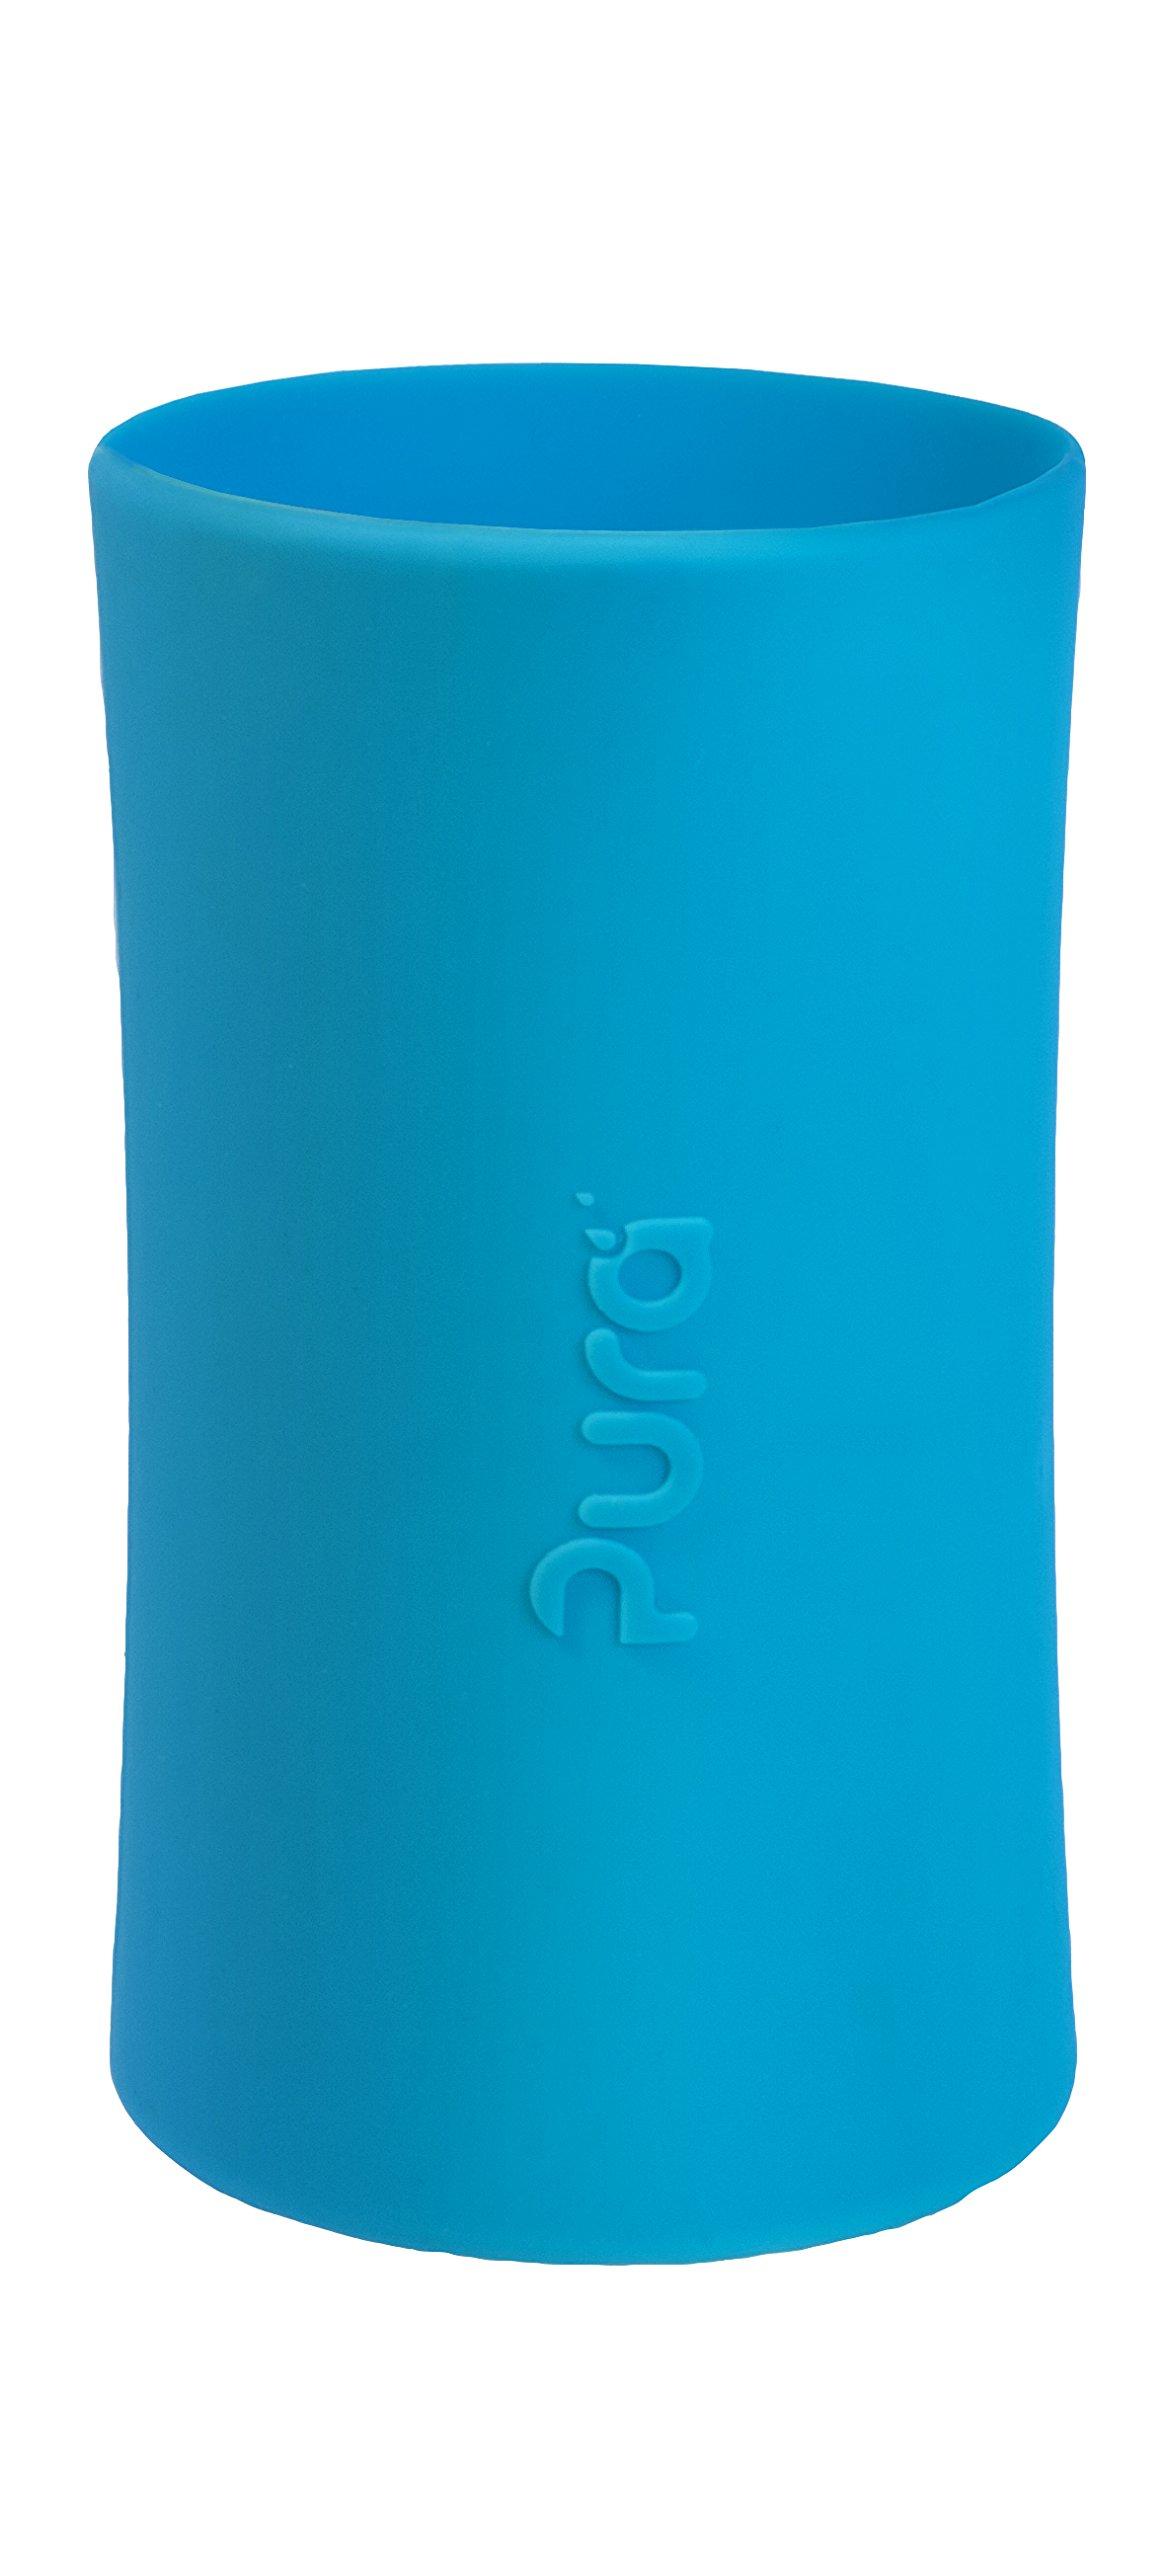 Pura Kiki Tall Silicone Sleeve for Bottle (Plastic Free, NonToxic Certified, BPA Free)